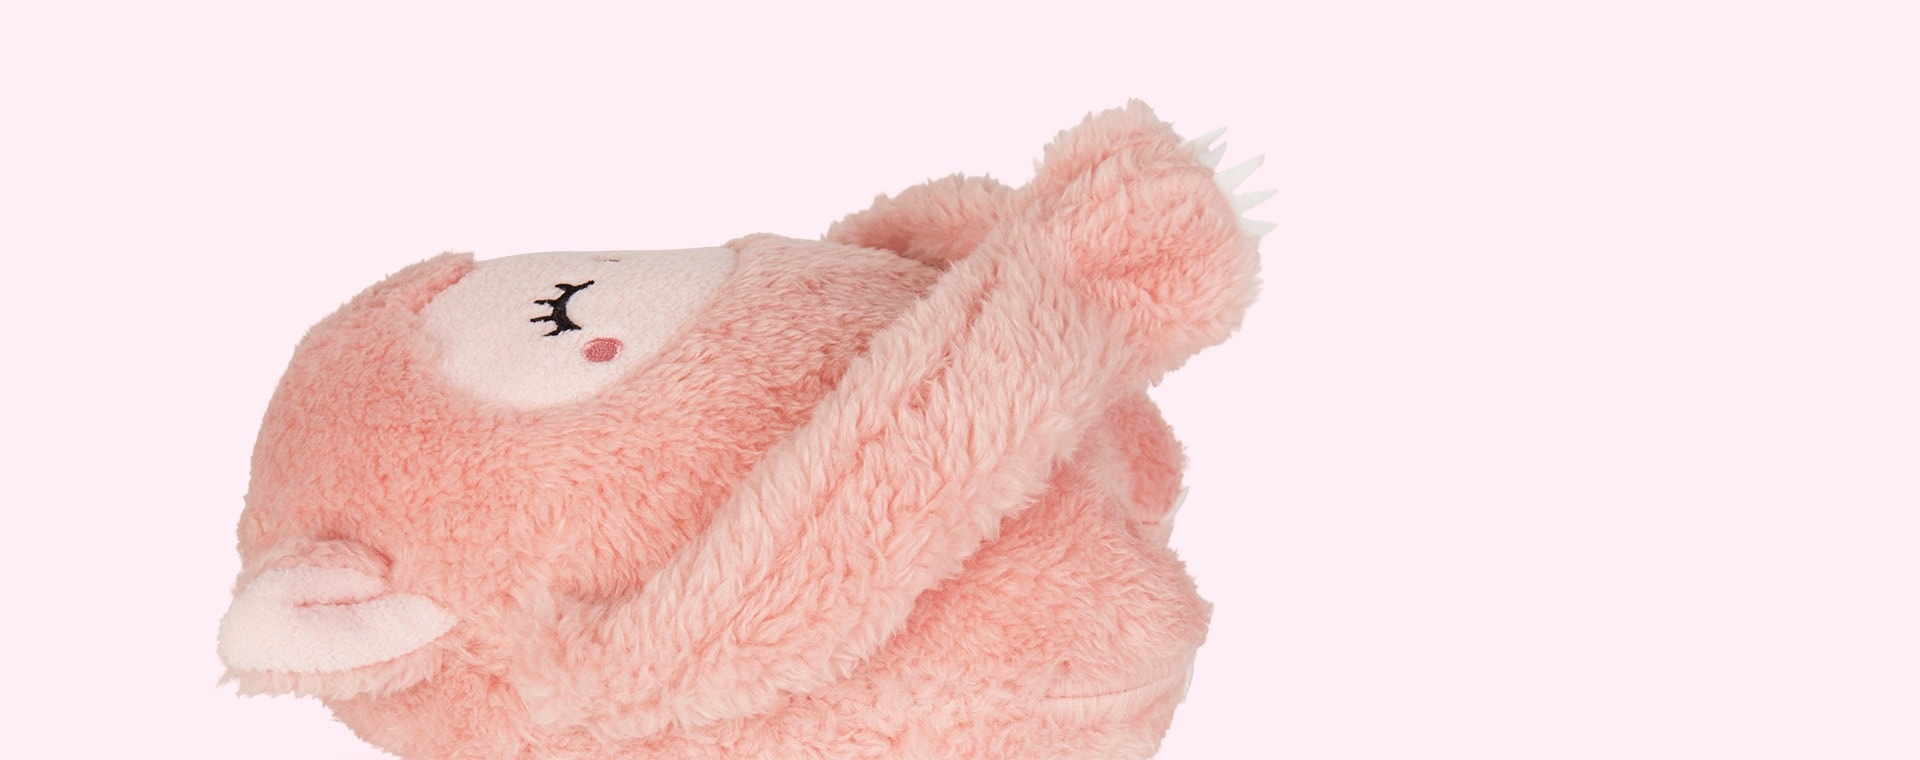 Pink Noodoll Riceaahaah Soft Toy